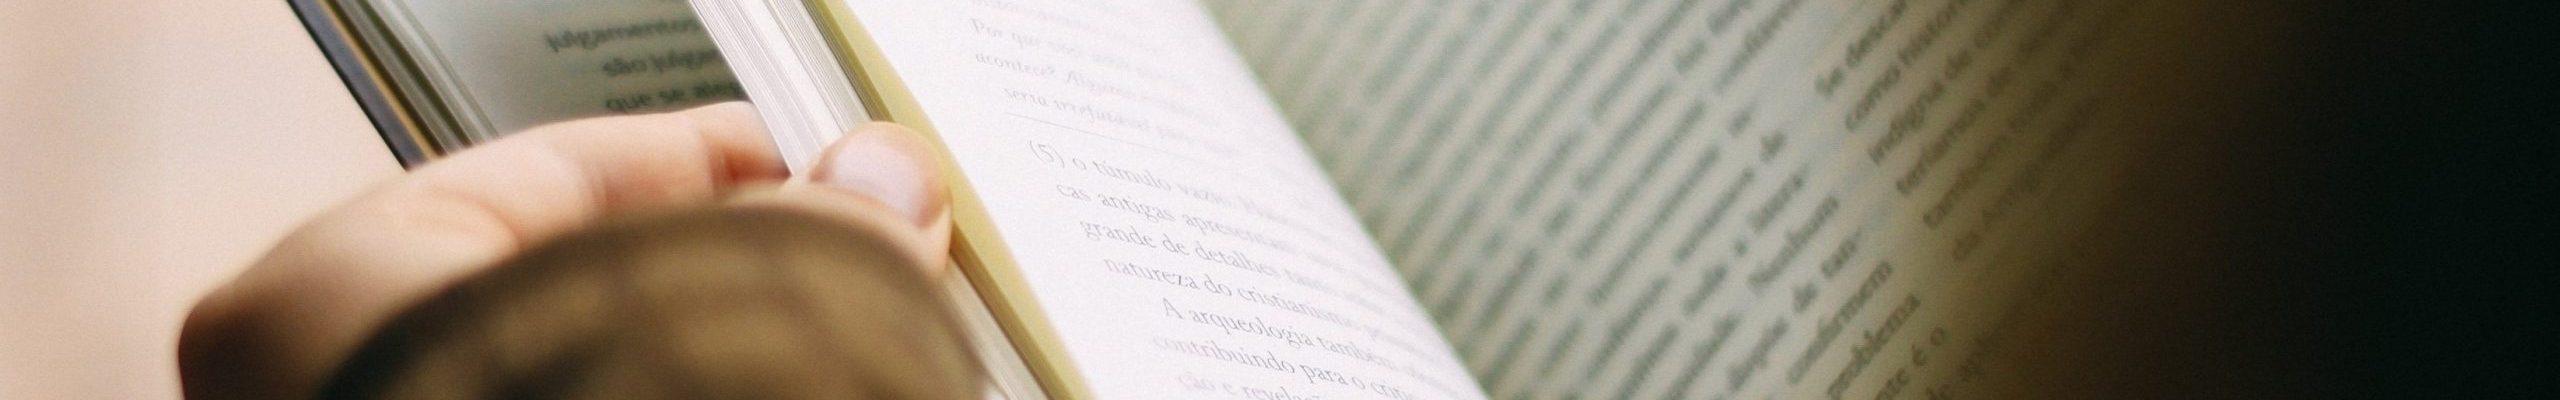 books-1149959 (2)